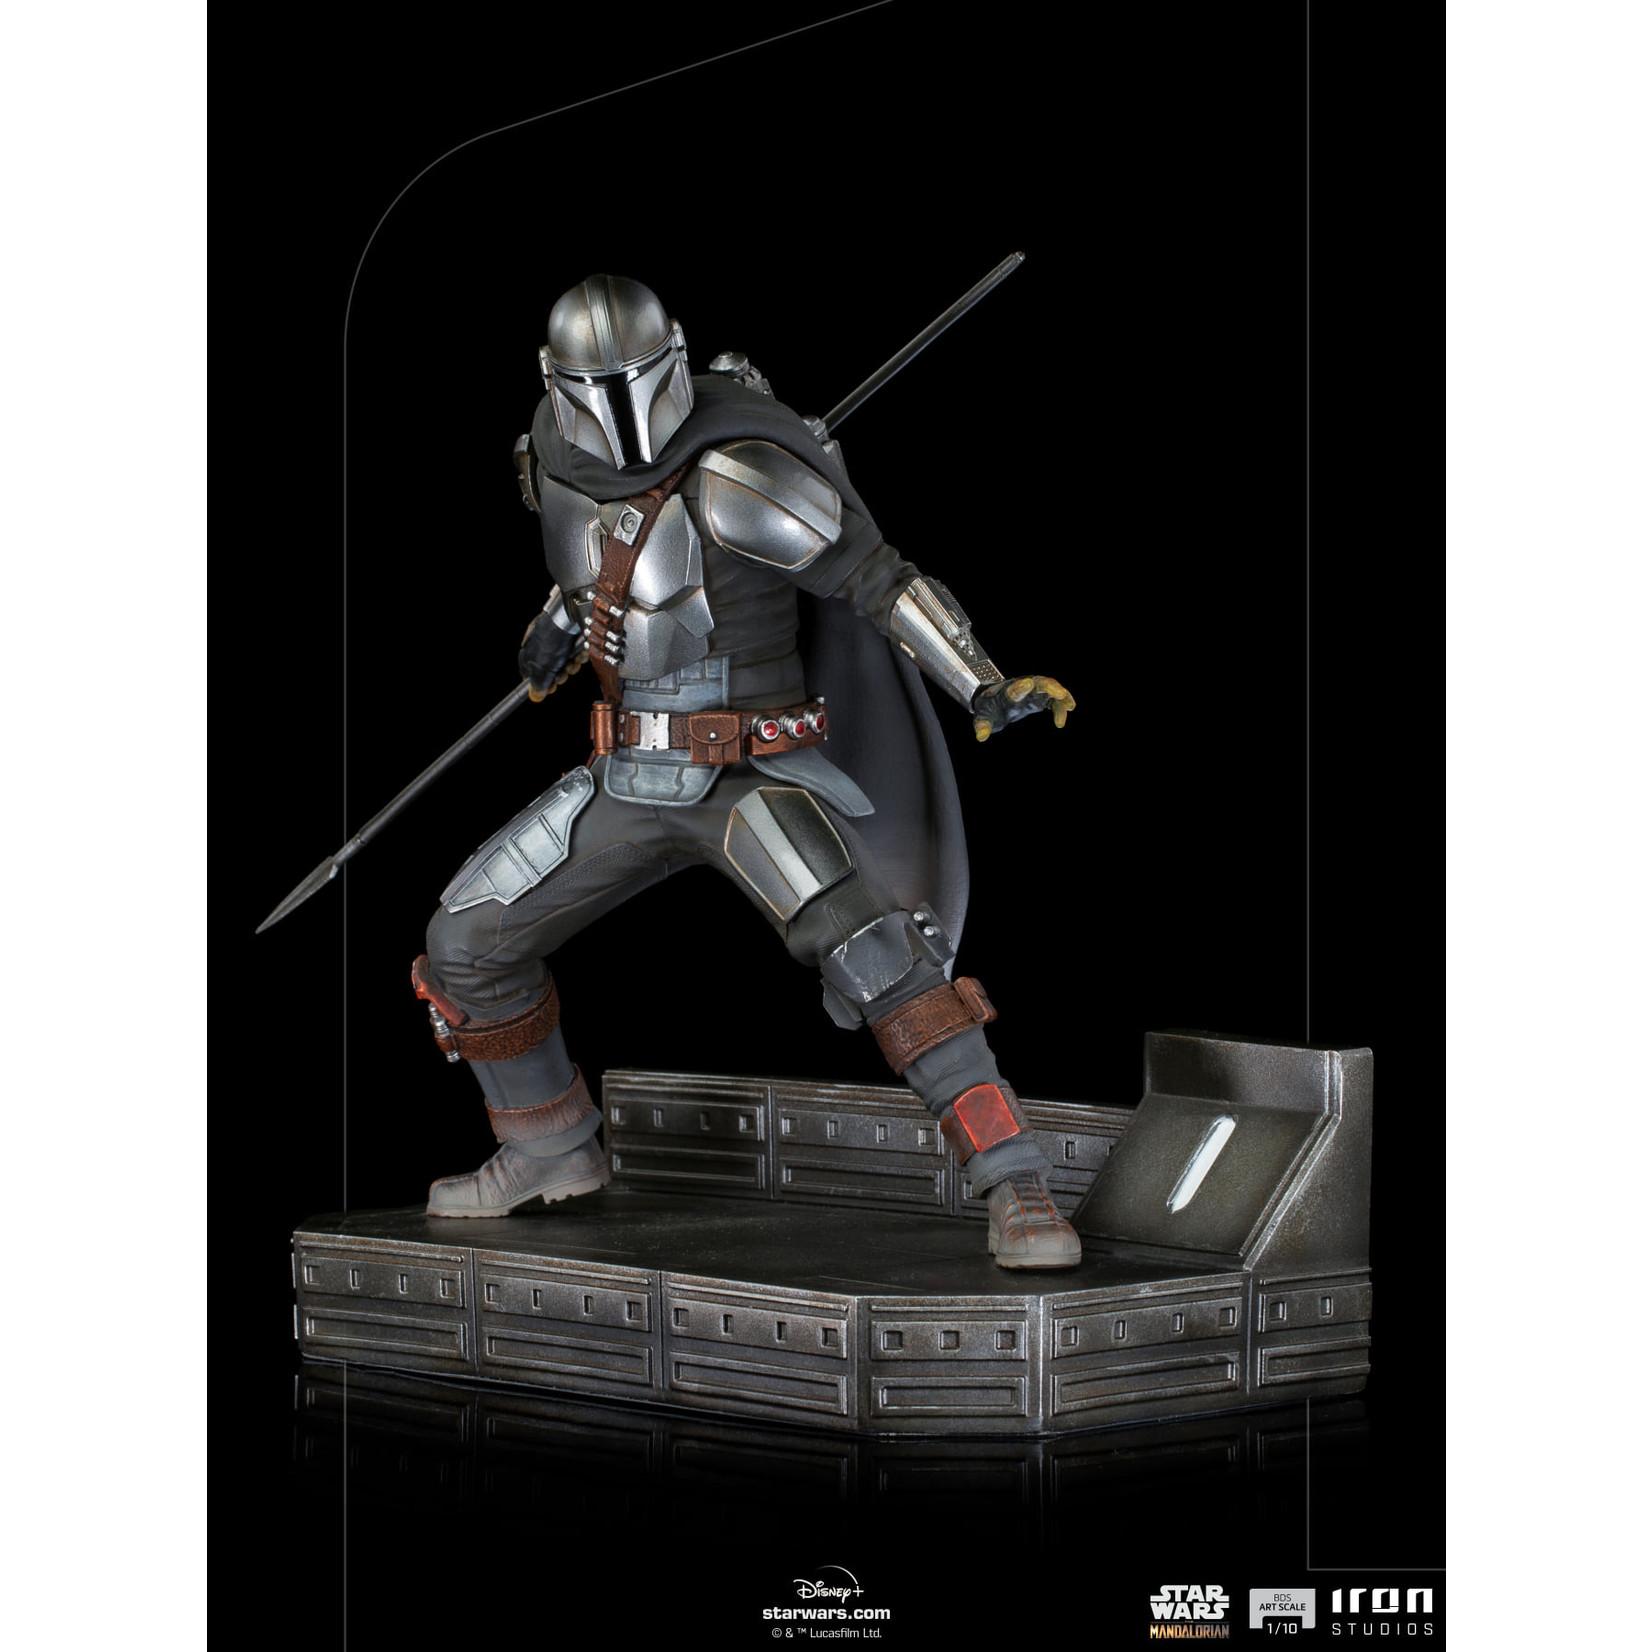 Iron Studios [Precommande] The Mandalorian Battle Diorama Series The Mandalorian 1/10 Art Scale Limited Edition Statue